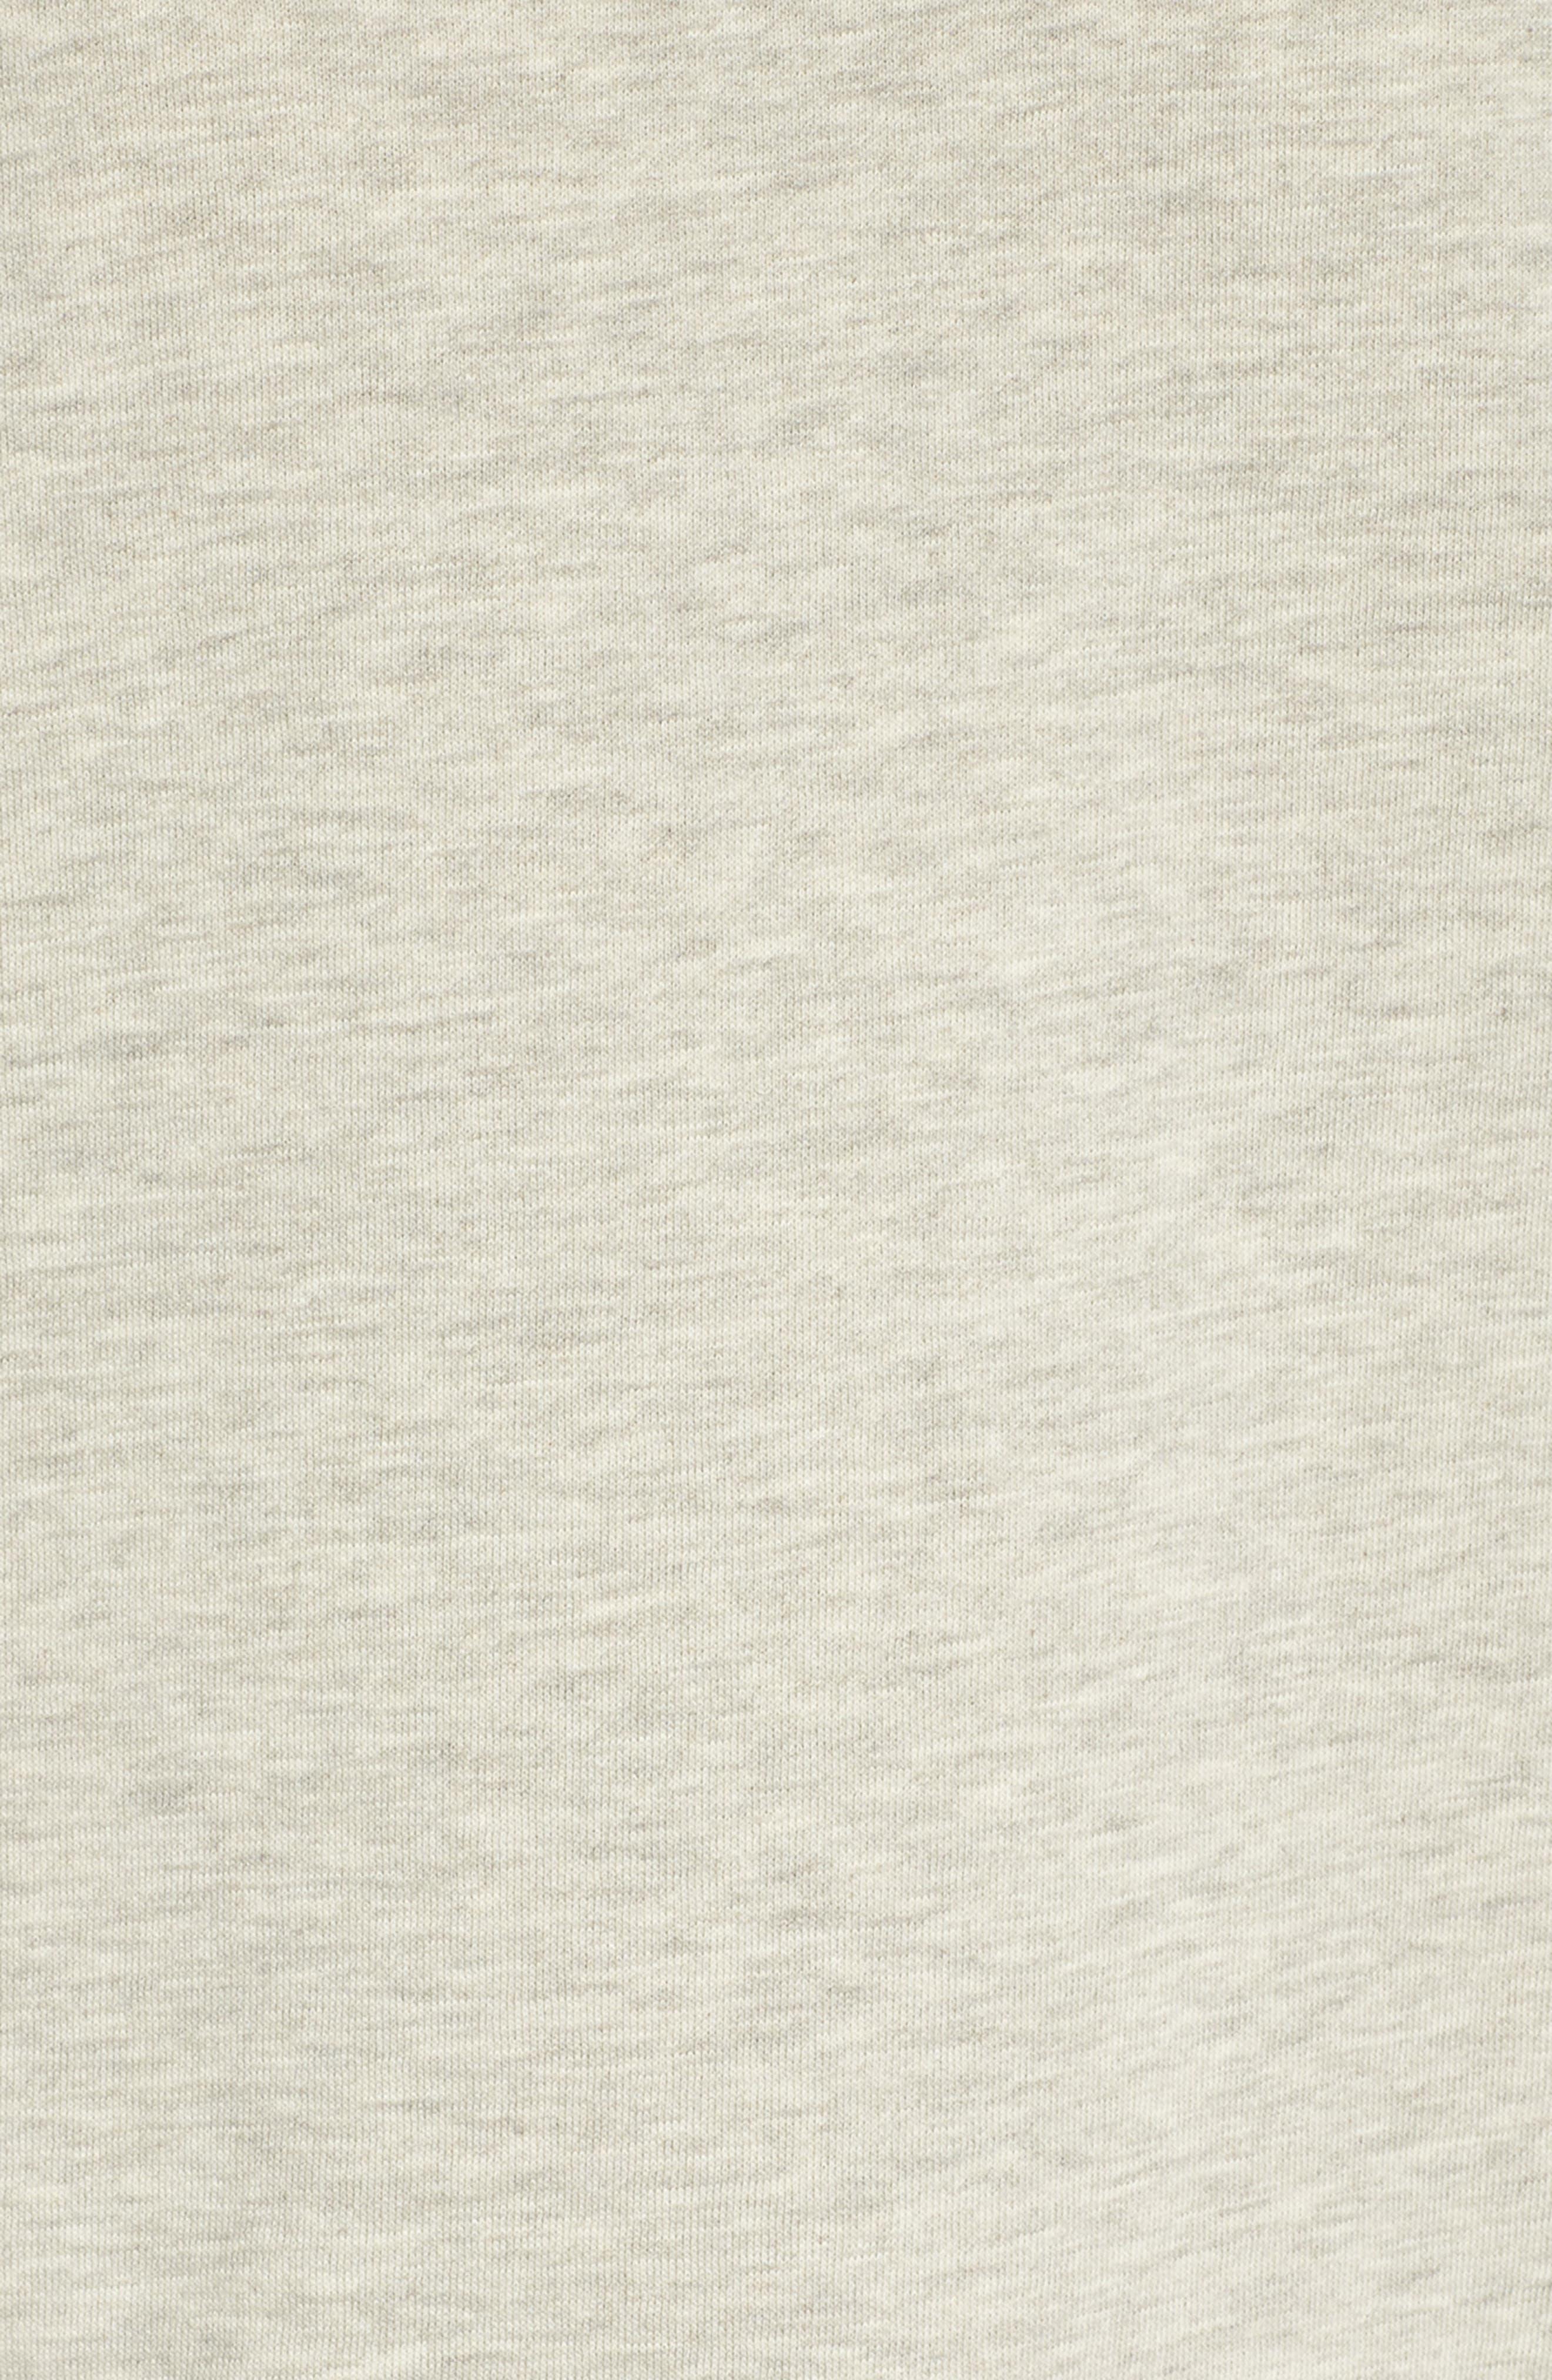 Sweatshirt,                             Alternate thumbnail 5, color,                             PEBBLE HEATHER / MAUVE